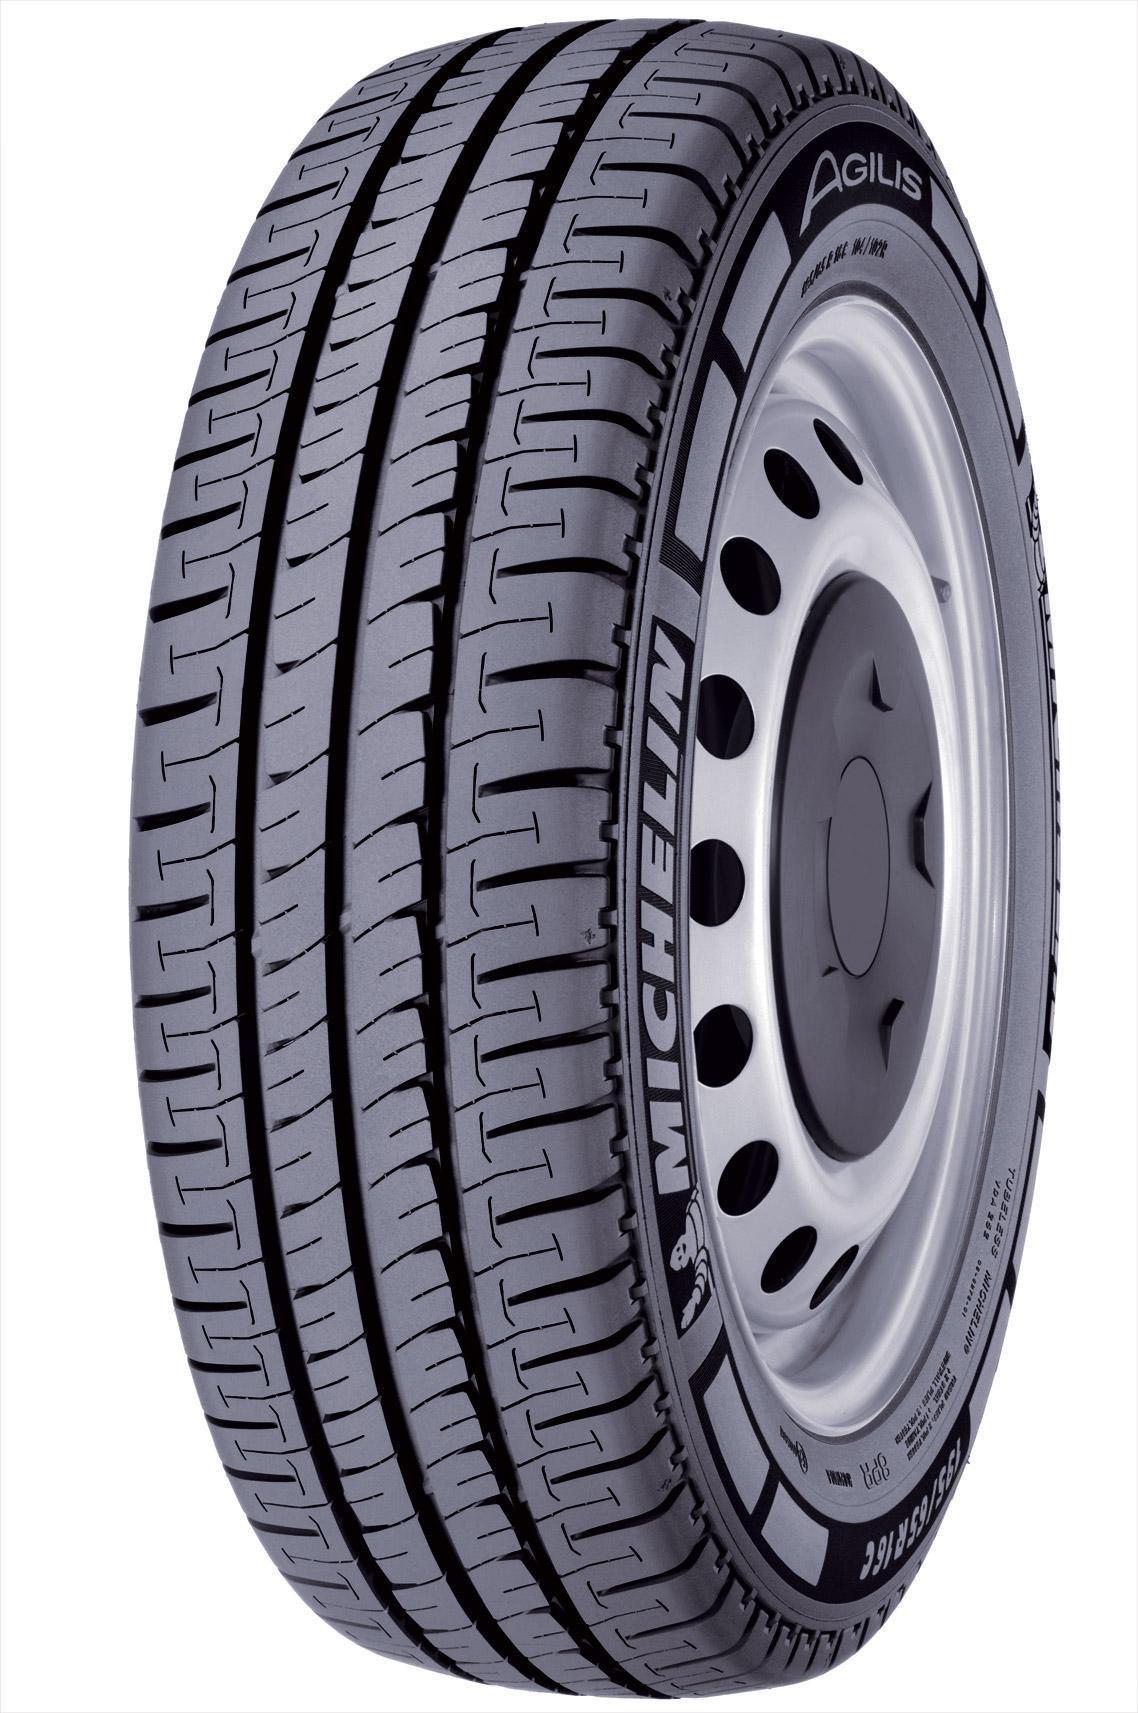 Michelin Agilis 195/65 R16C 104/102R GRNX